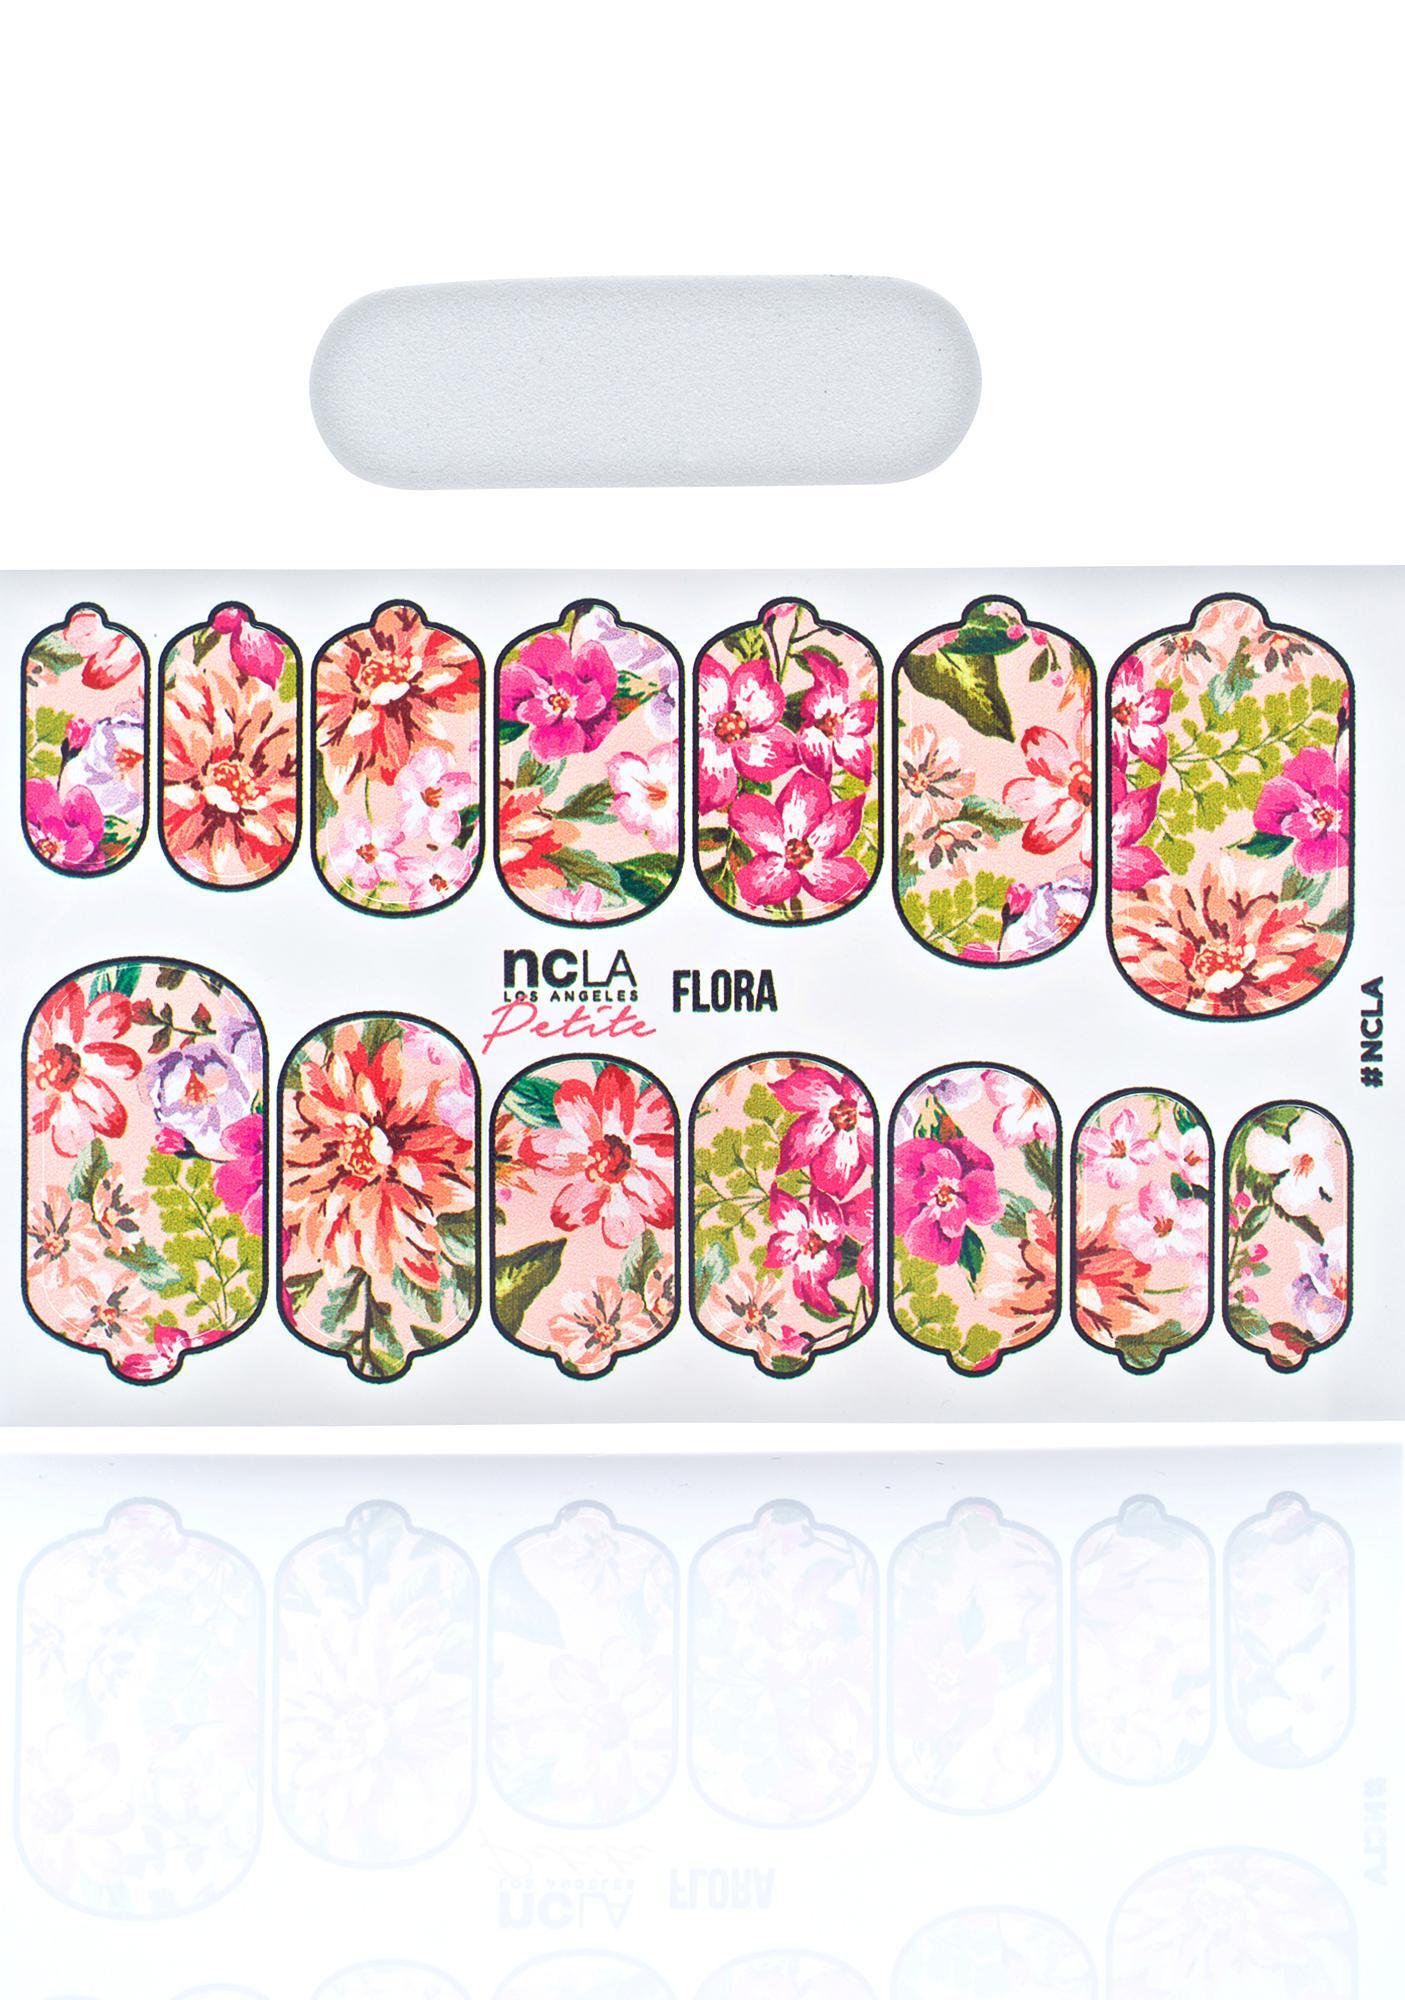 NCLA Flora Petite Nail Wraps